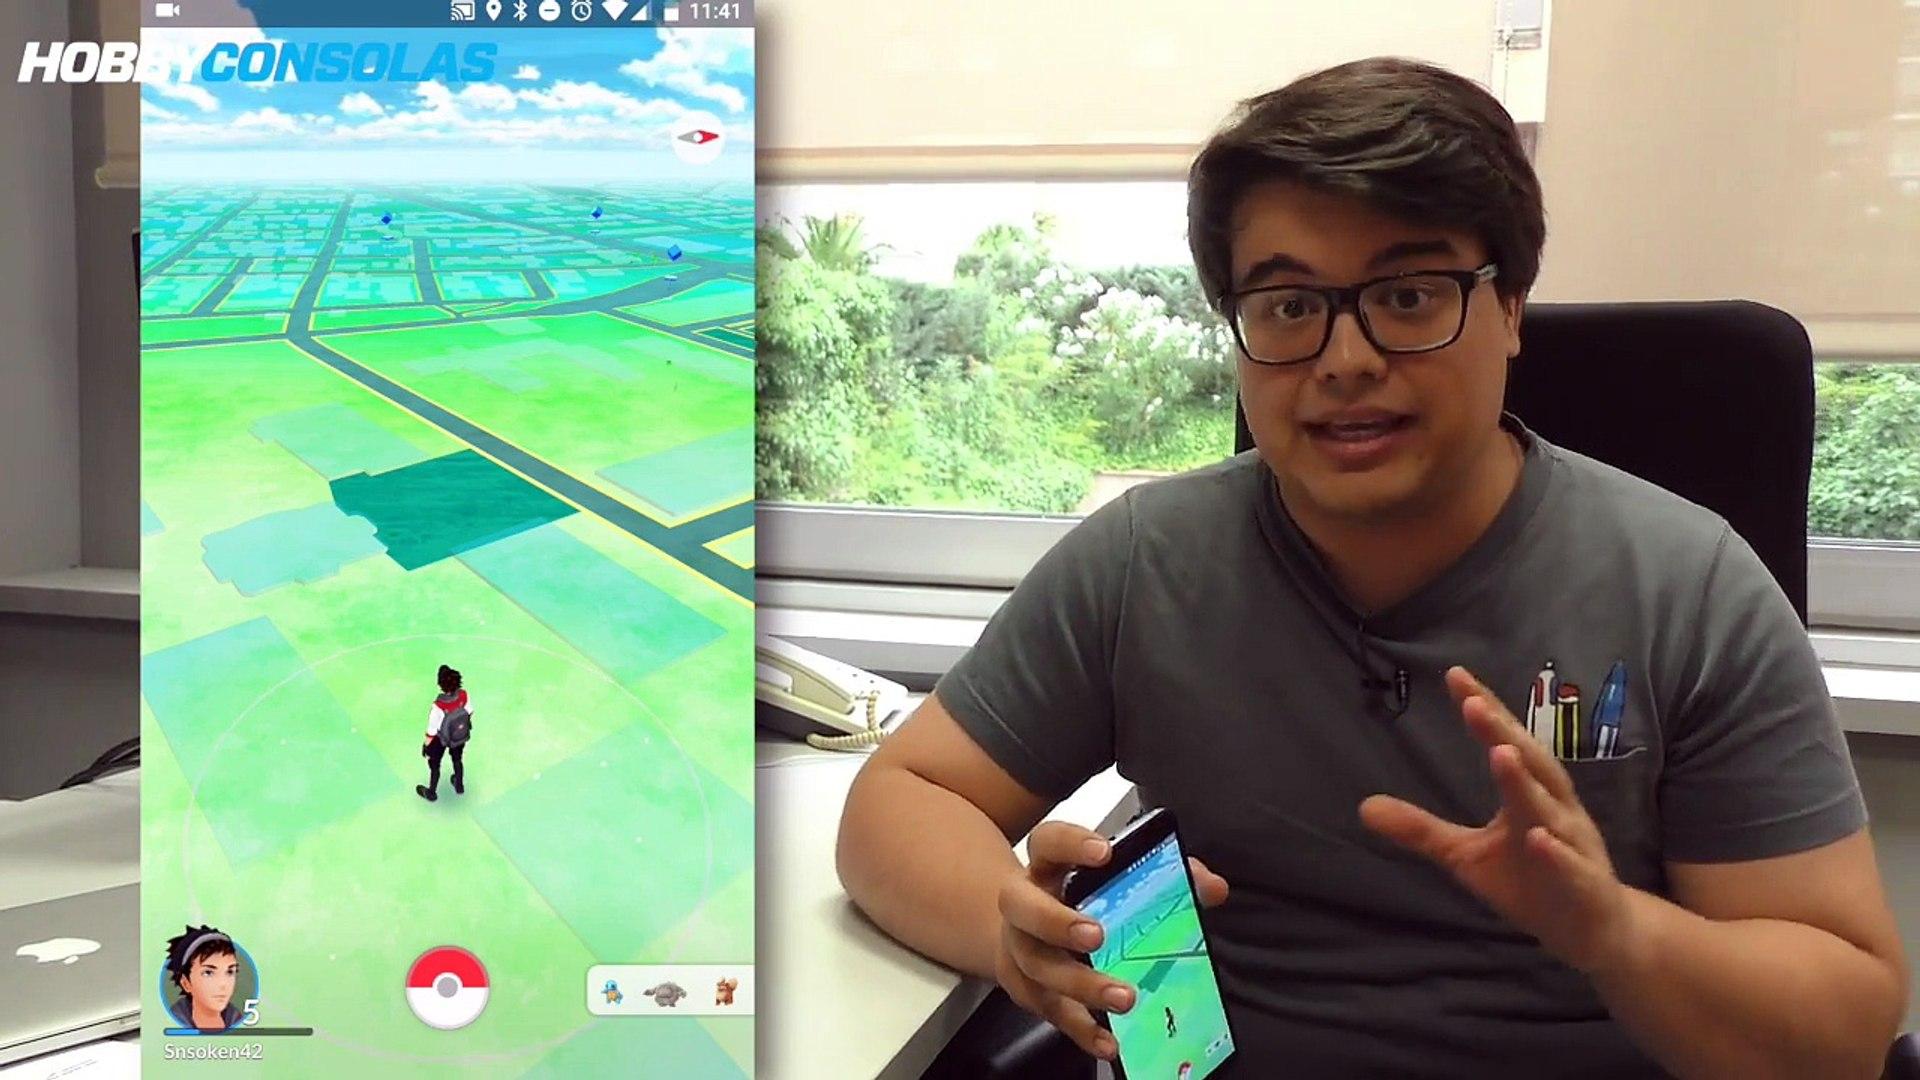 Pokémon GO - Cómo capturar Pokémon sin andar